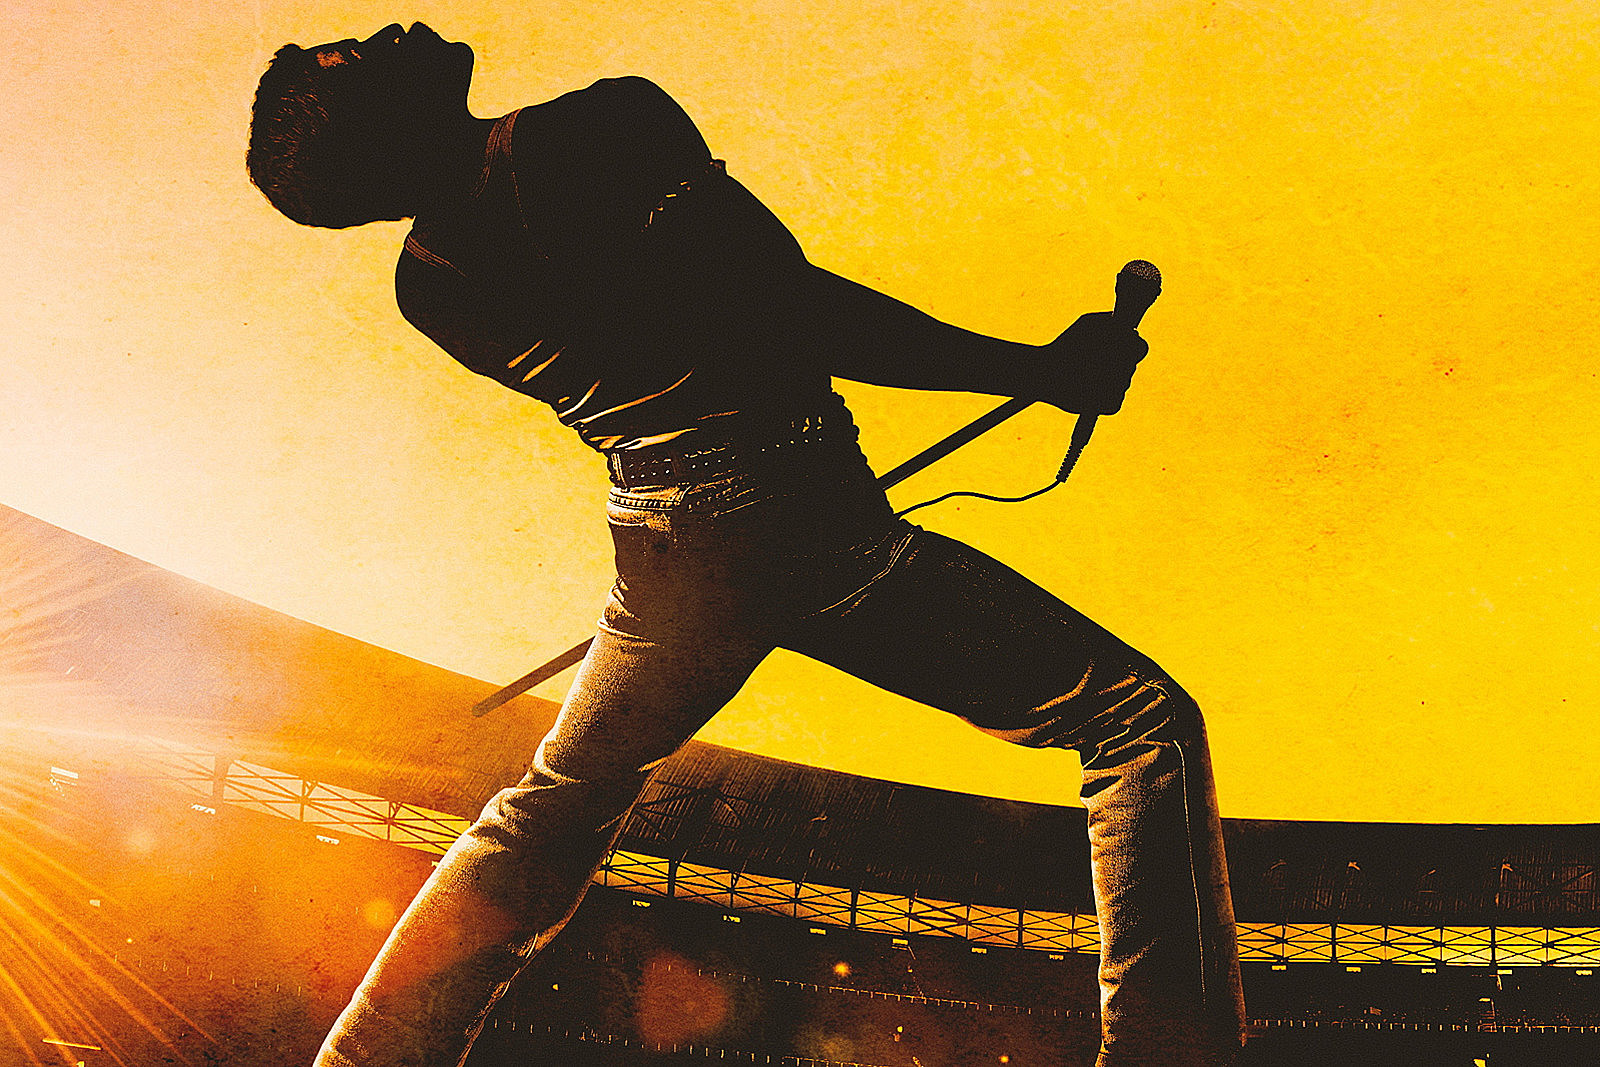 'Bohemian Rhapsody' Editor Responds to Oscar Criticism